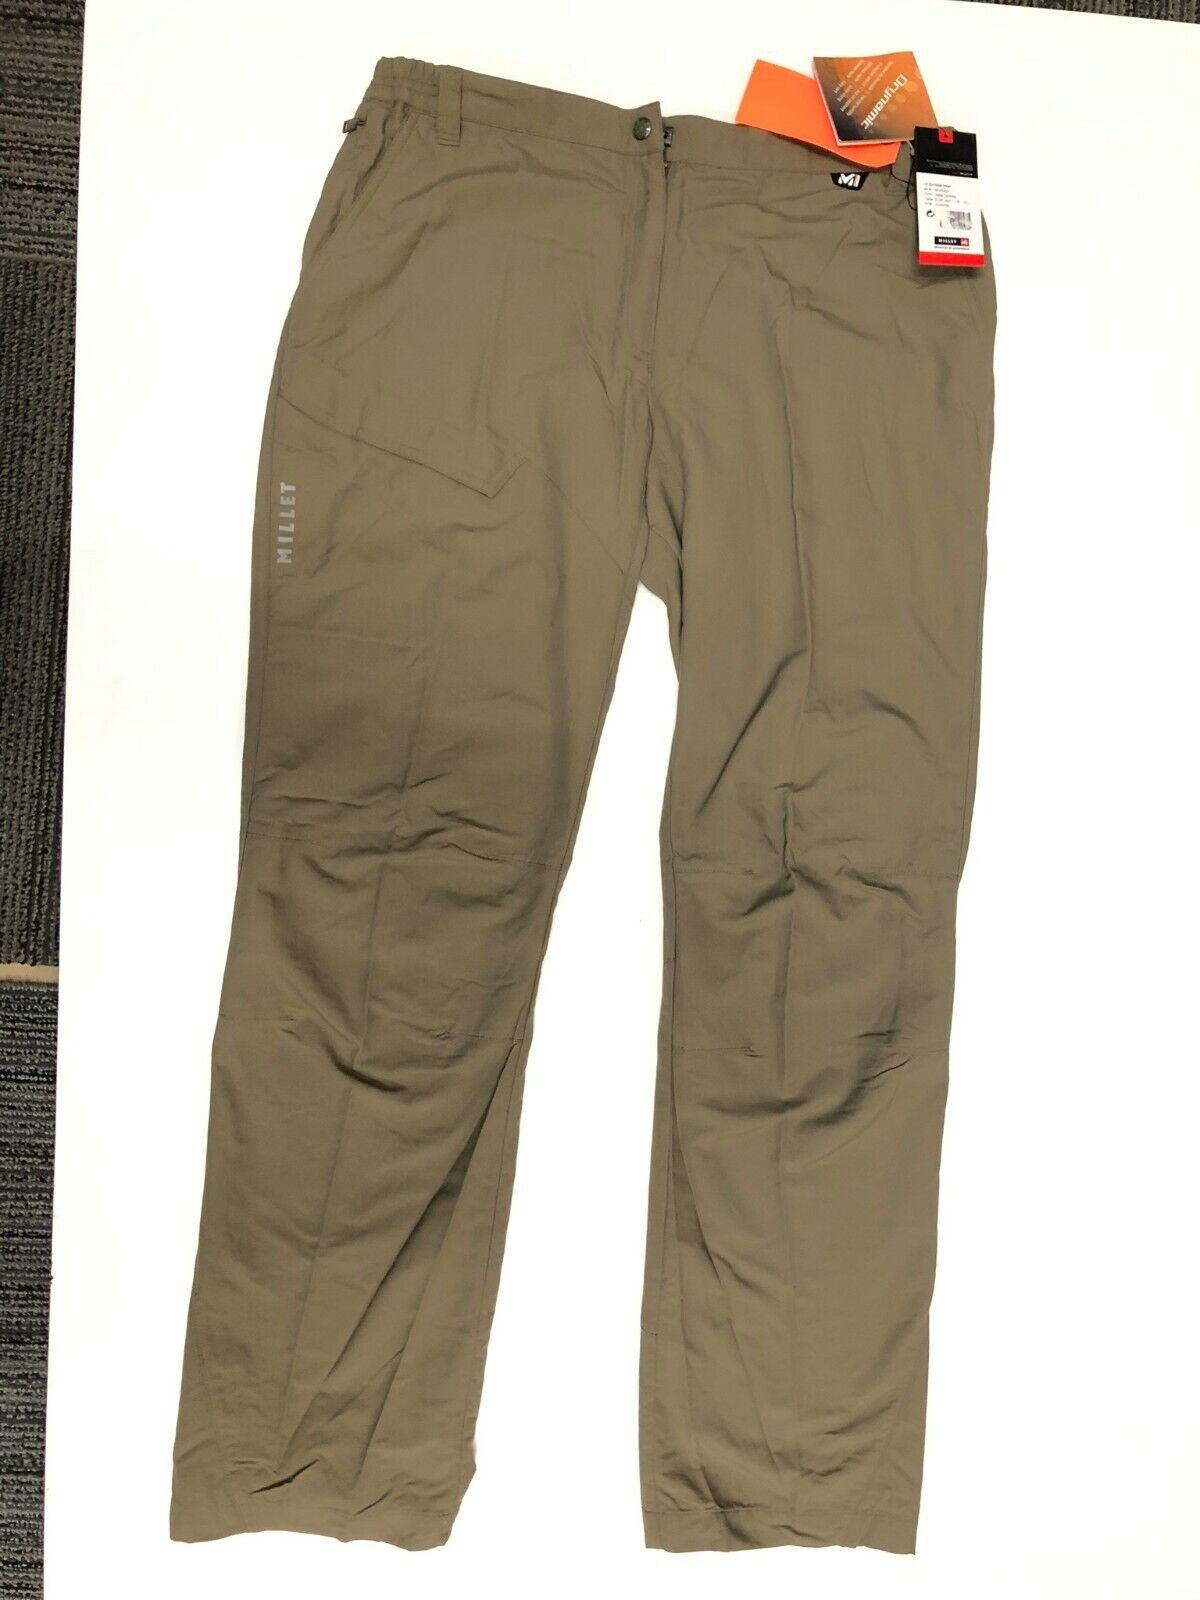 Millet LD Outside Pant - Womens Ski snowboard Pants terre Eur 44L US 12 Large